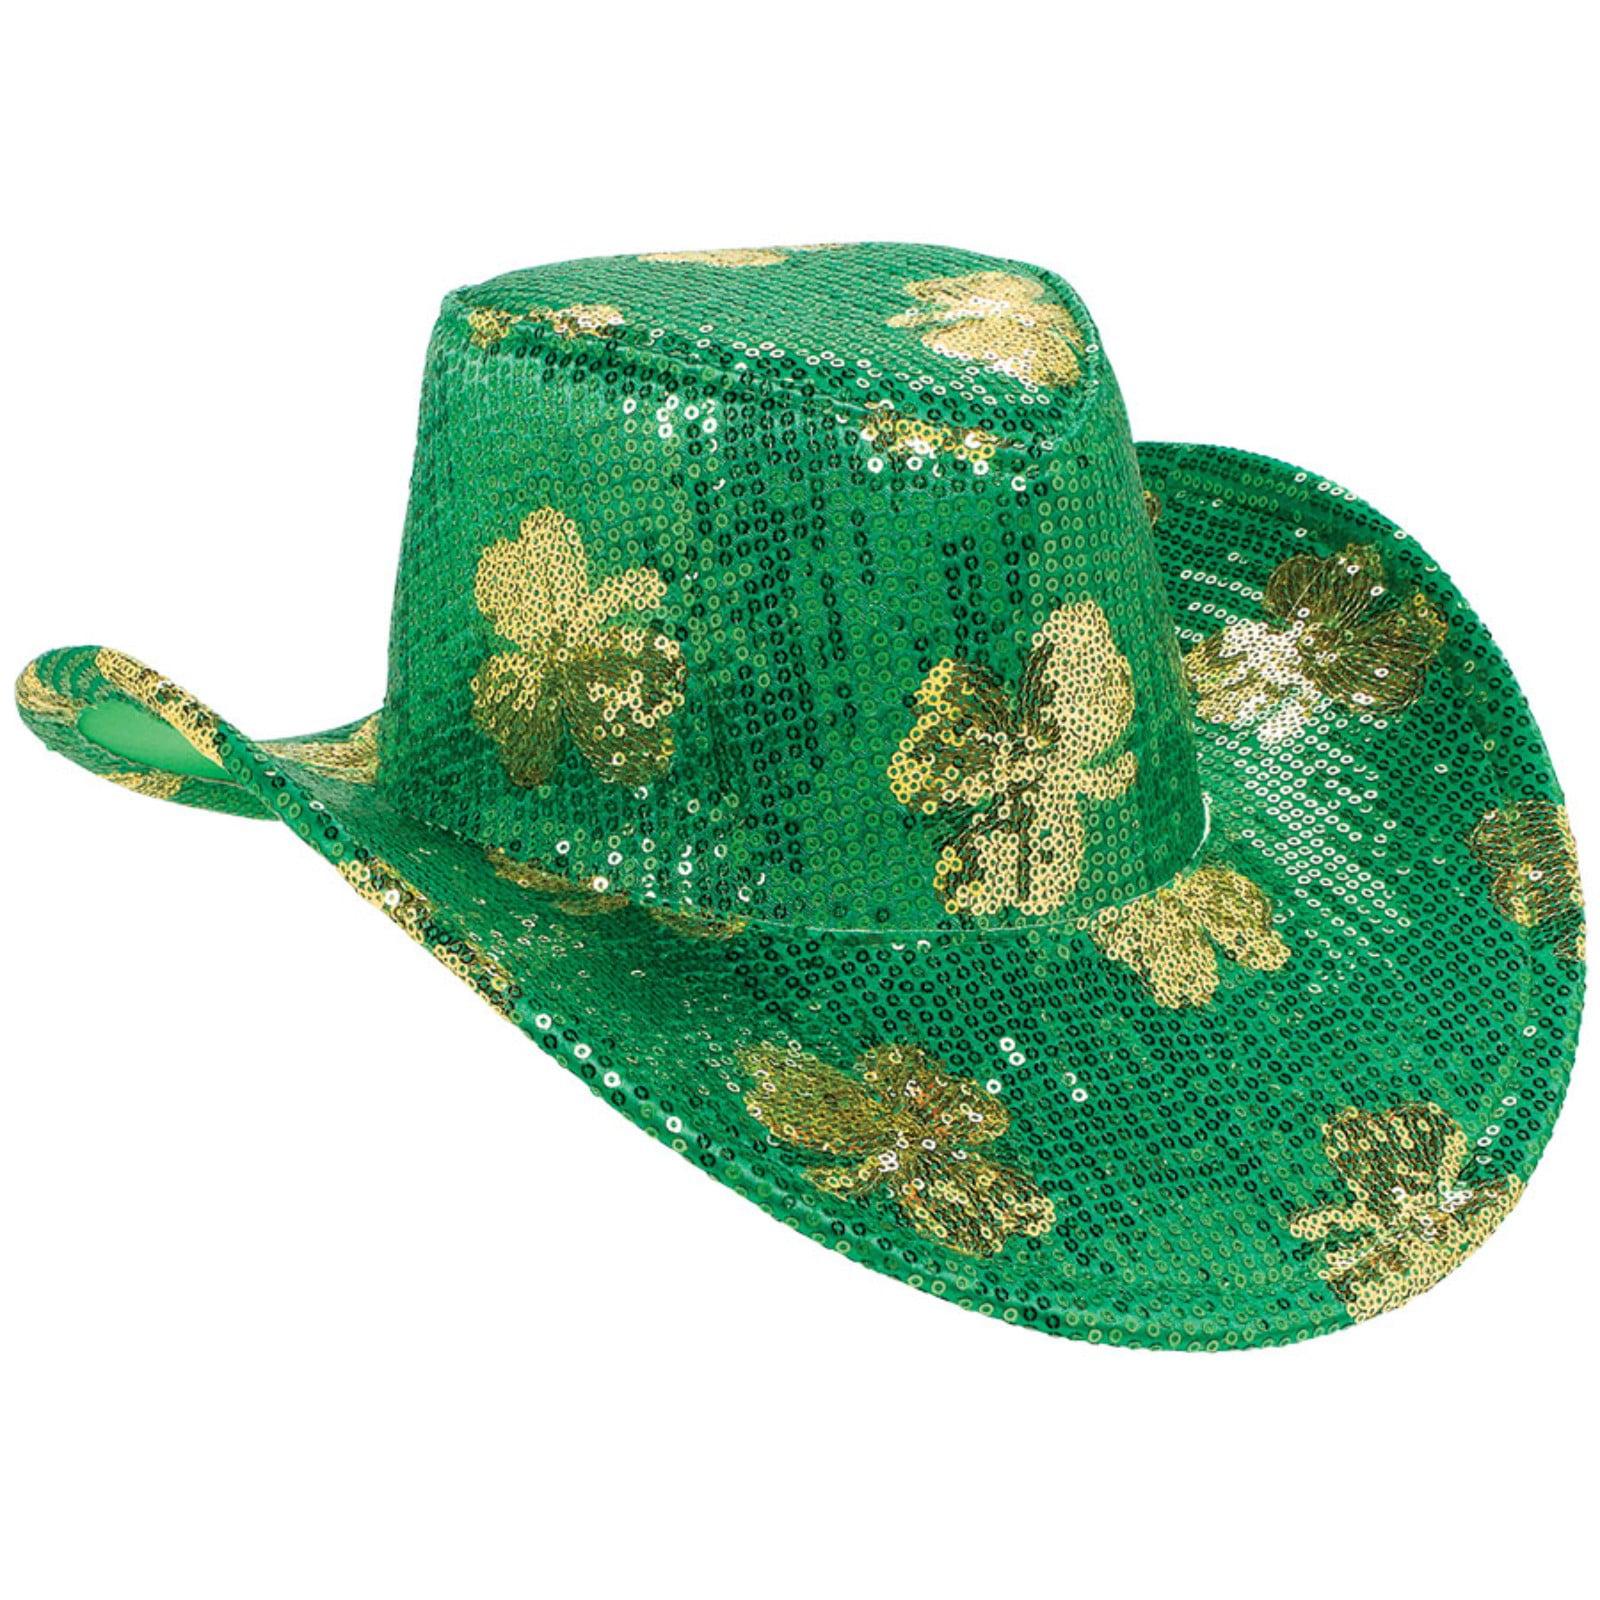 5cf663a1dbf Greg Bourdy Cowboy Hats Amazon Uk